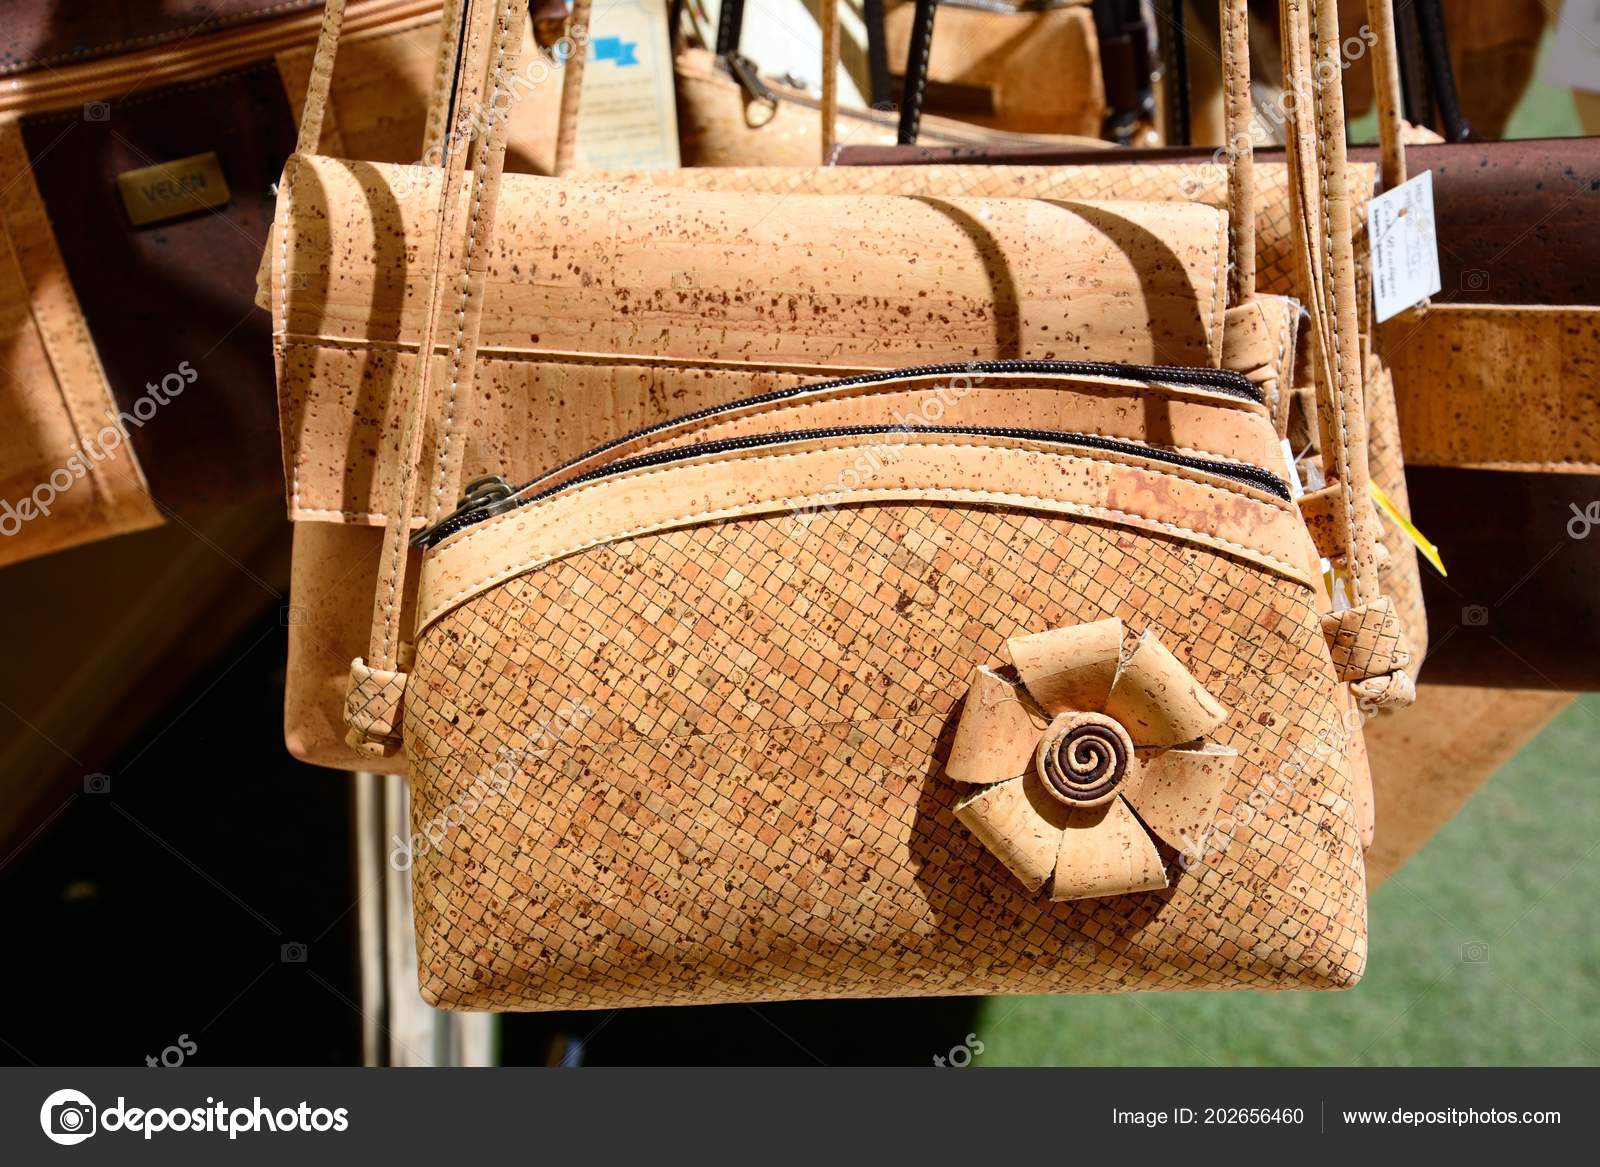 07137b2923623 Silves Portugalsko Června 2017 Korkové Kabelky Prodej Mimo Obchod Starém —  Stock fotografie